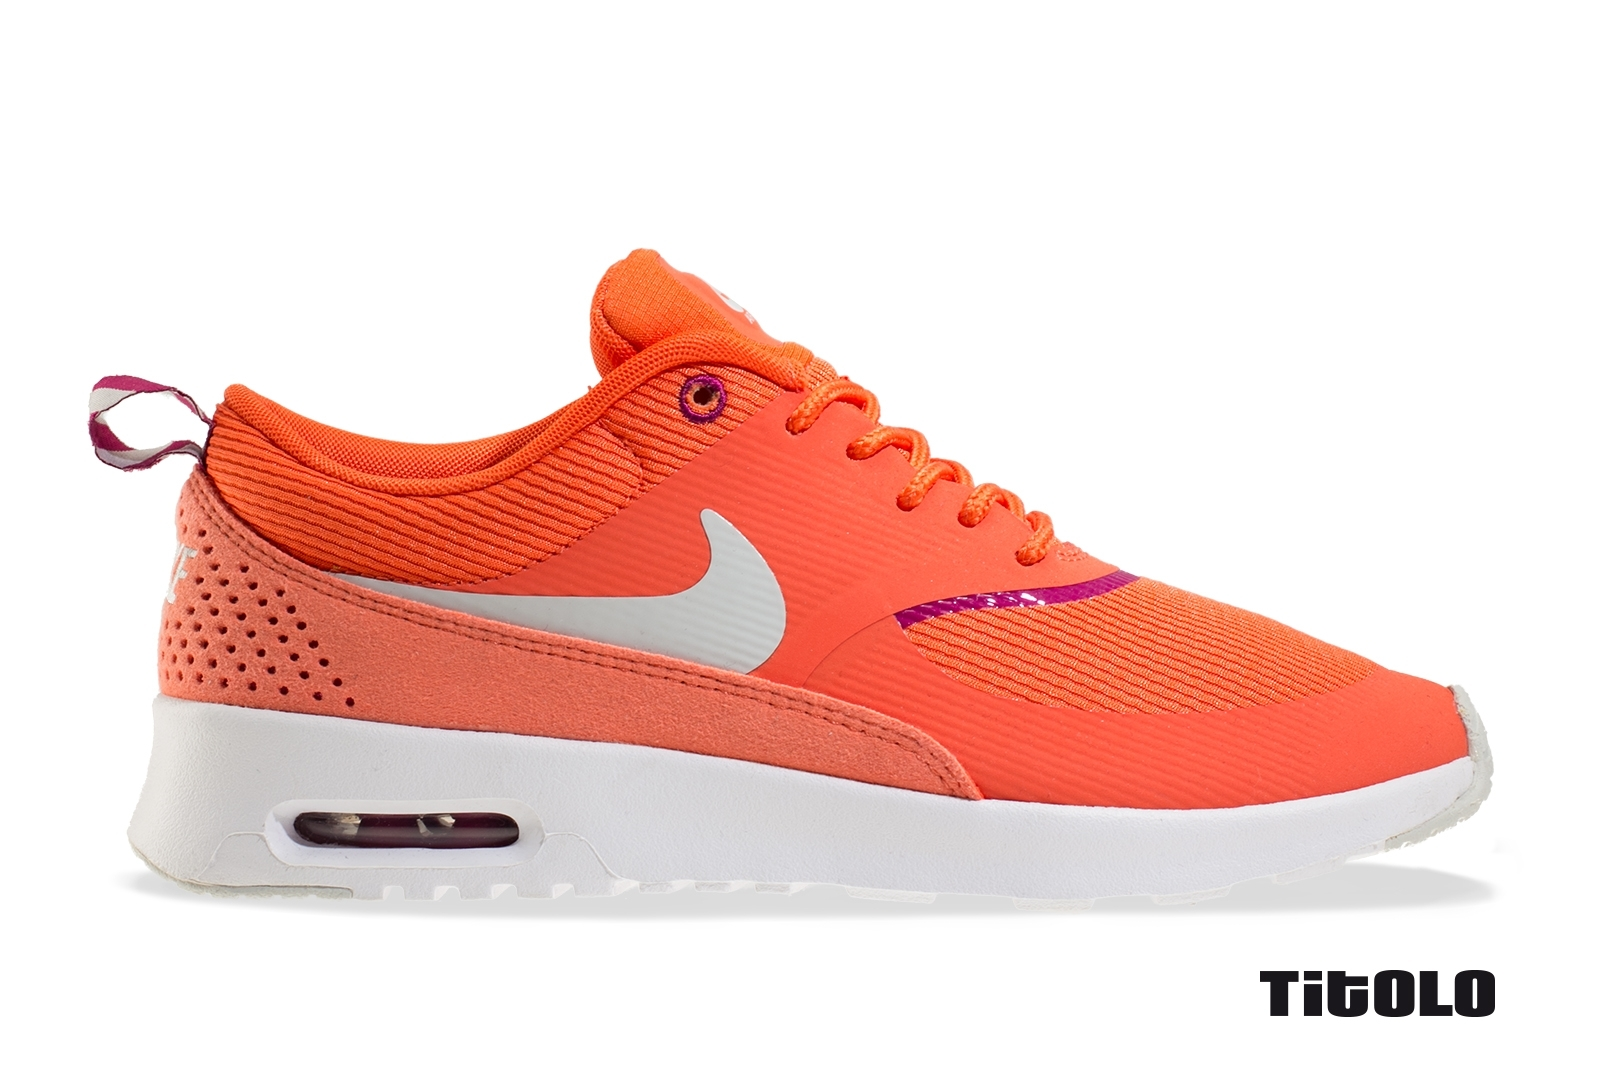 Nike Wmns Air Max Thea 599409-800 599409 800 Turf Orange/Spray-Bright Magenta-Wh